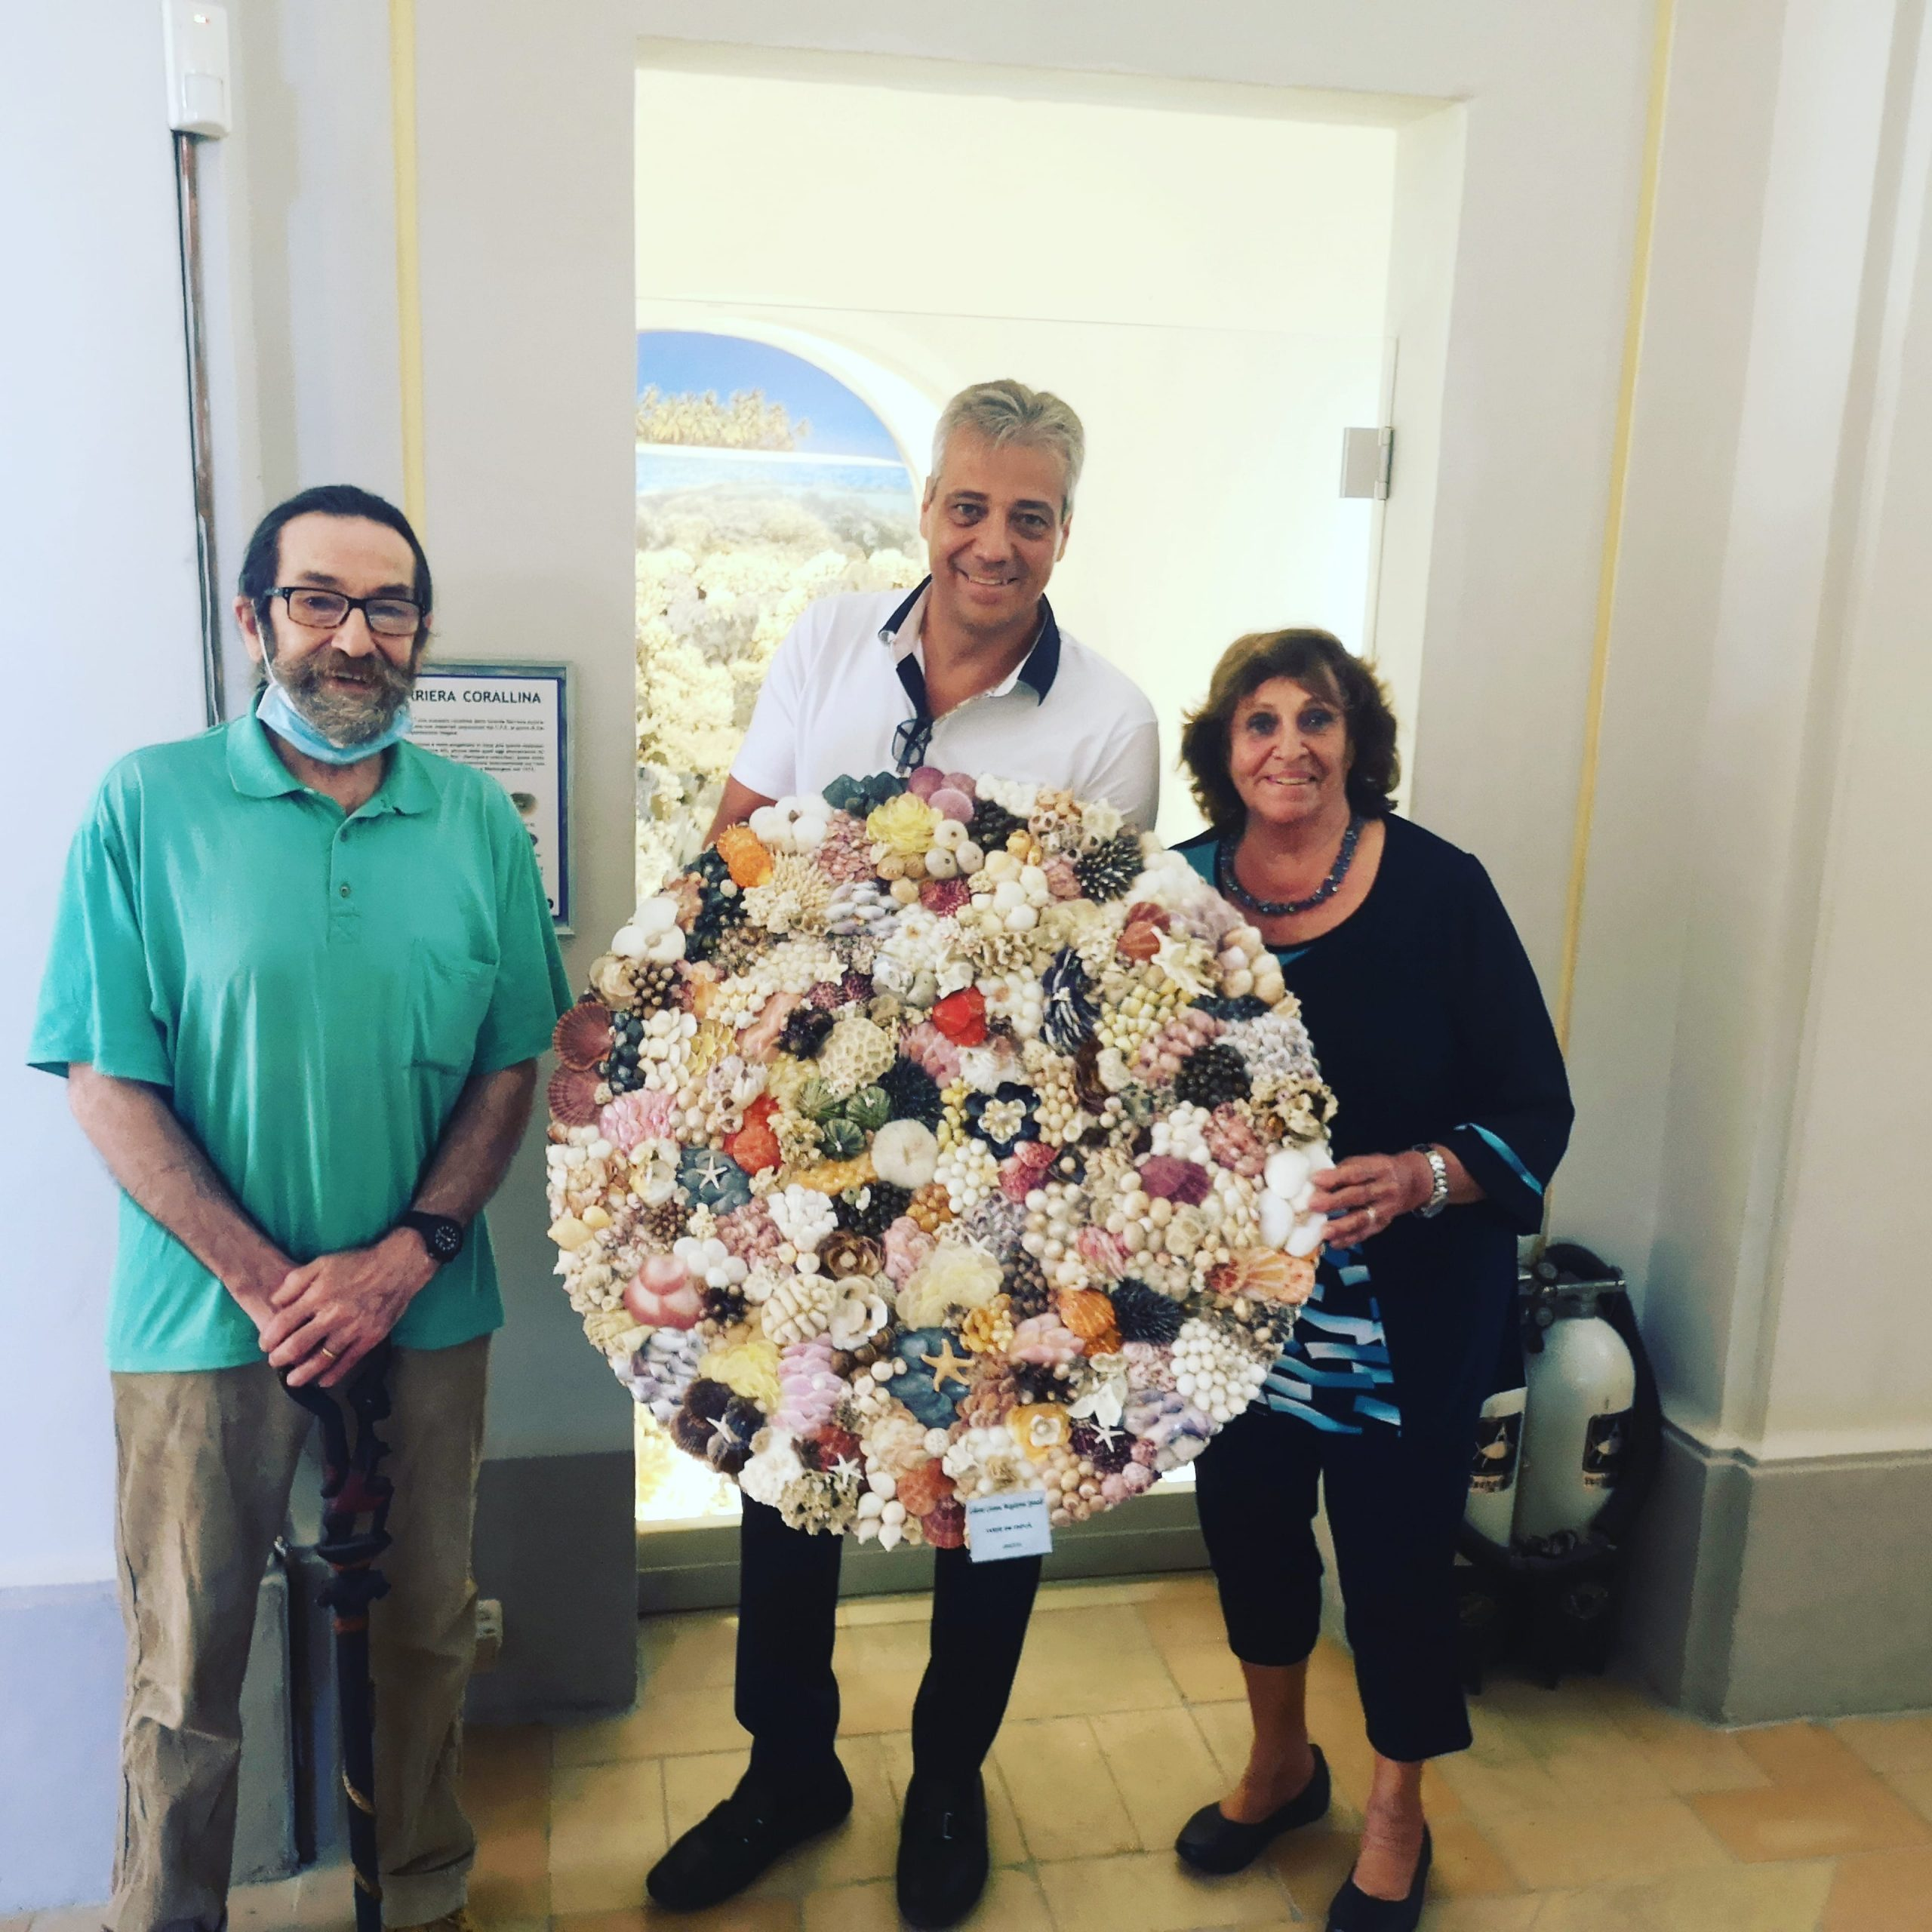 DAL BRASILE PER DONARE UN'OPERA D'ARTE AL MUSEO MALAKOS